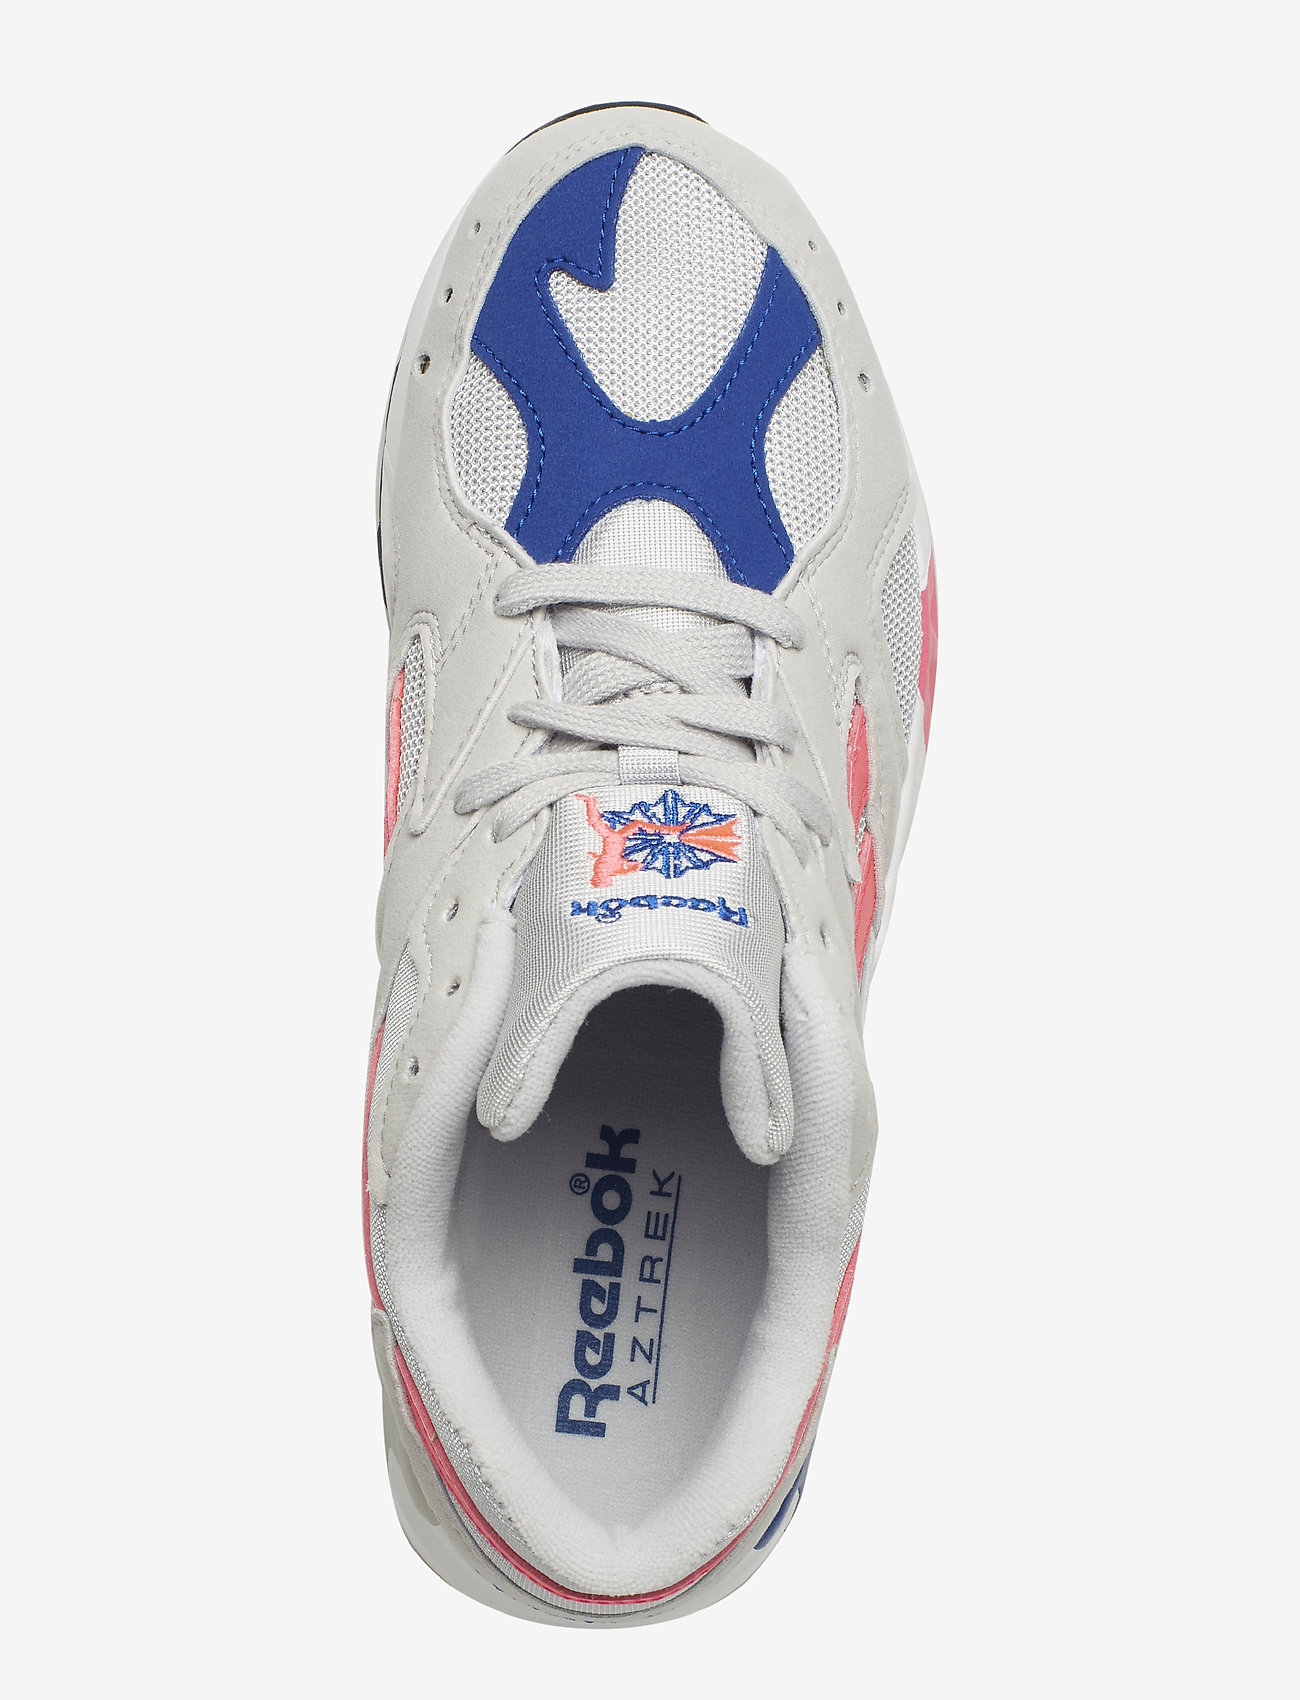 Reebok Classics Aztrek - Sneakers Grey/acid Pink/royal/